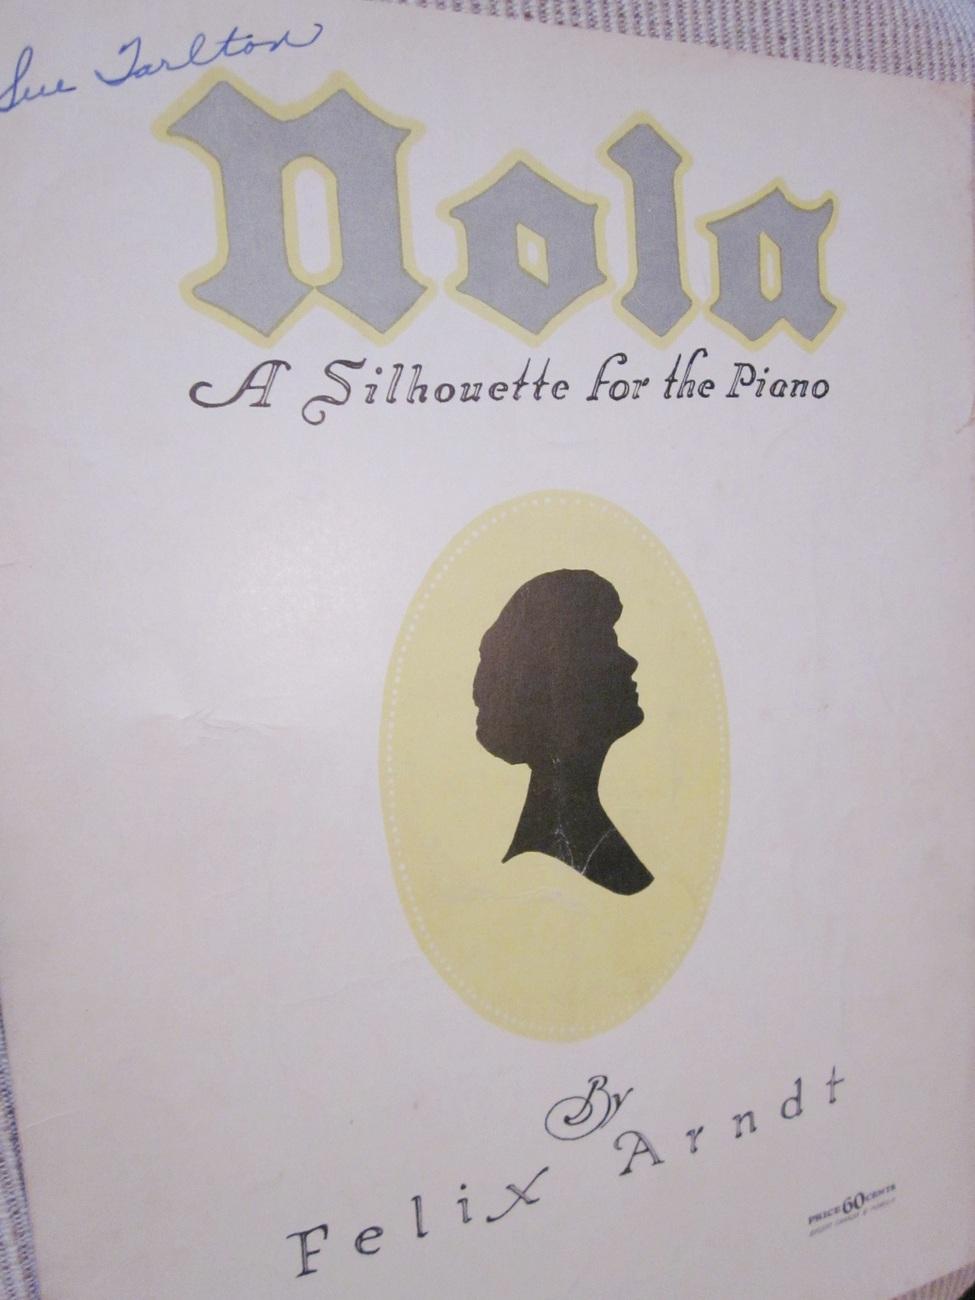 Vintage Sheet Music Nola 1942 by Felix Arndt - Piano Music